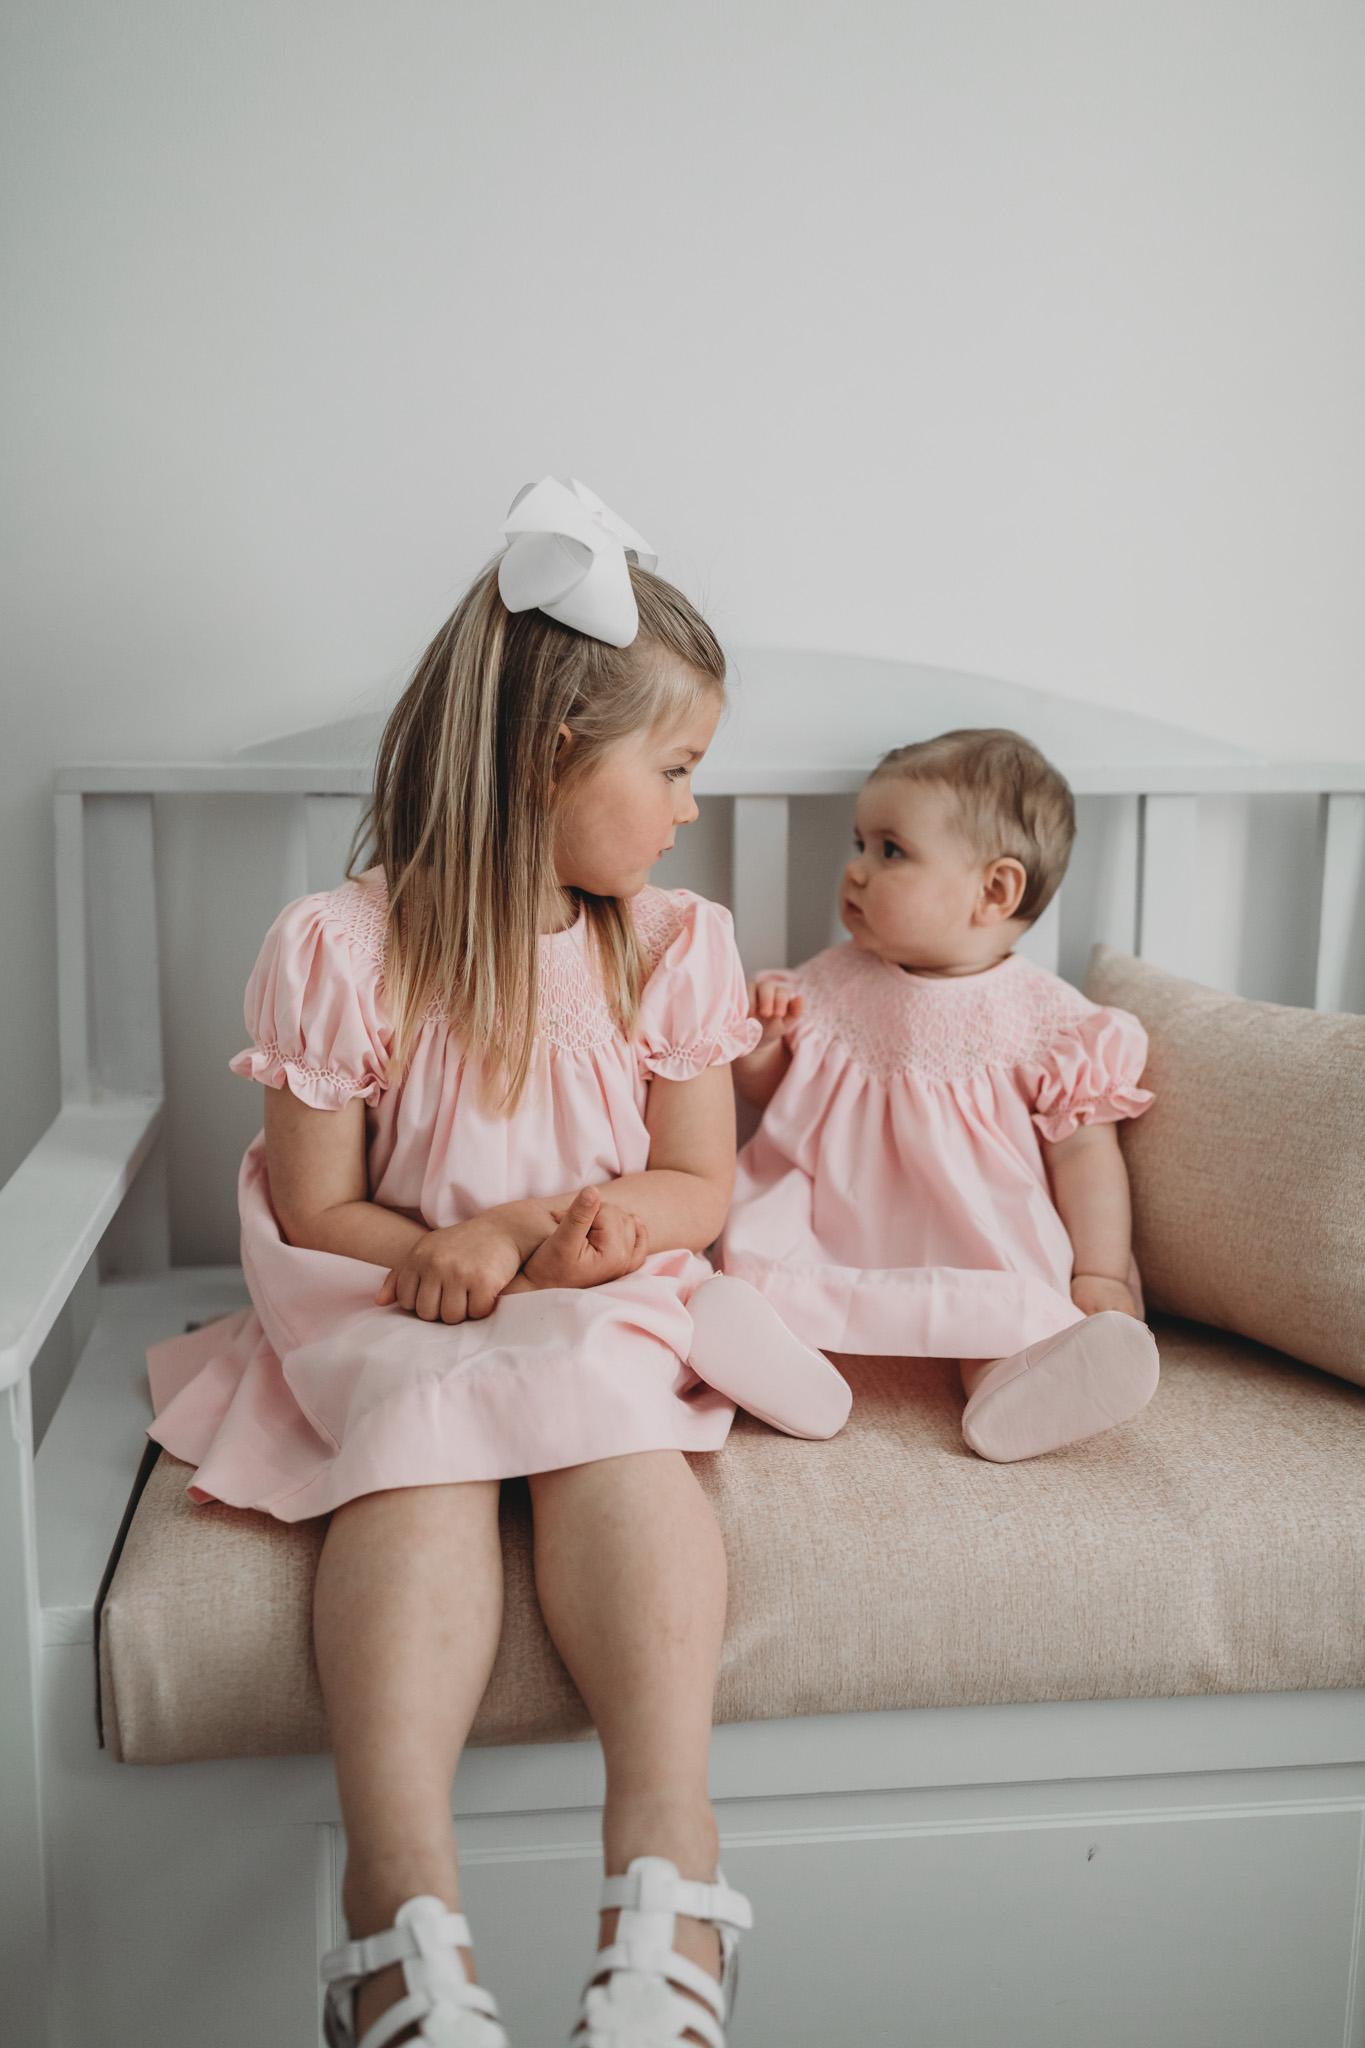 Big Sister and Baby Sister